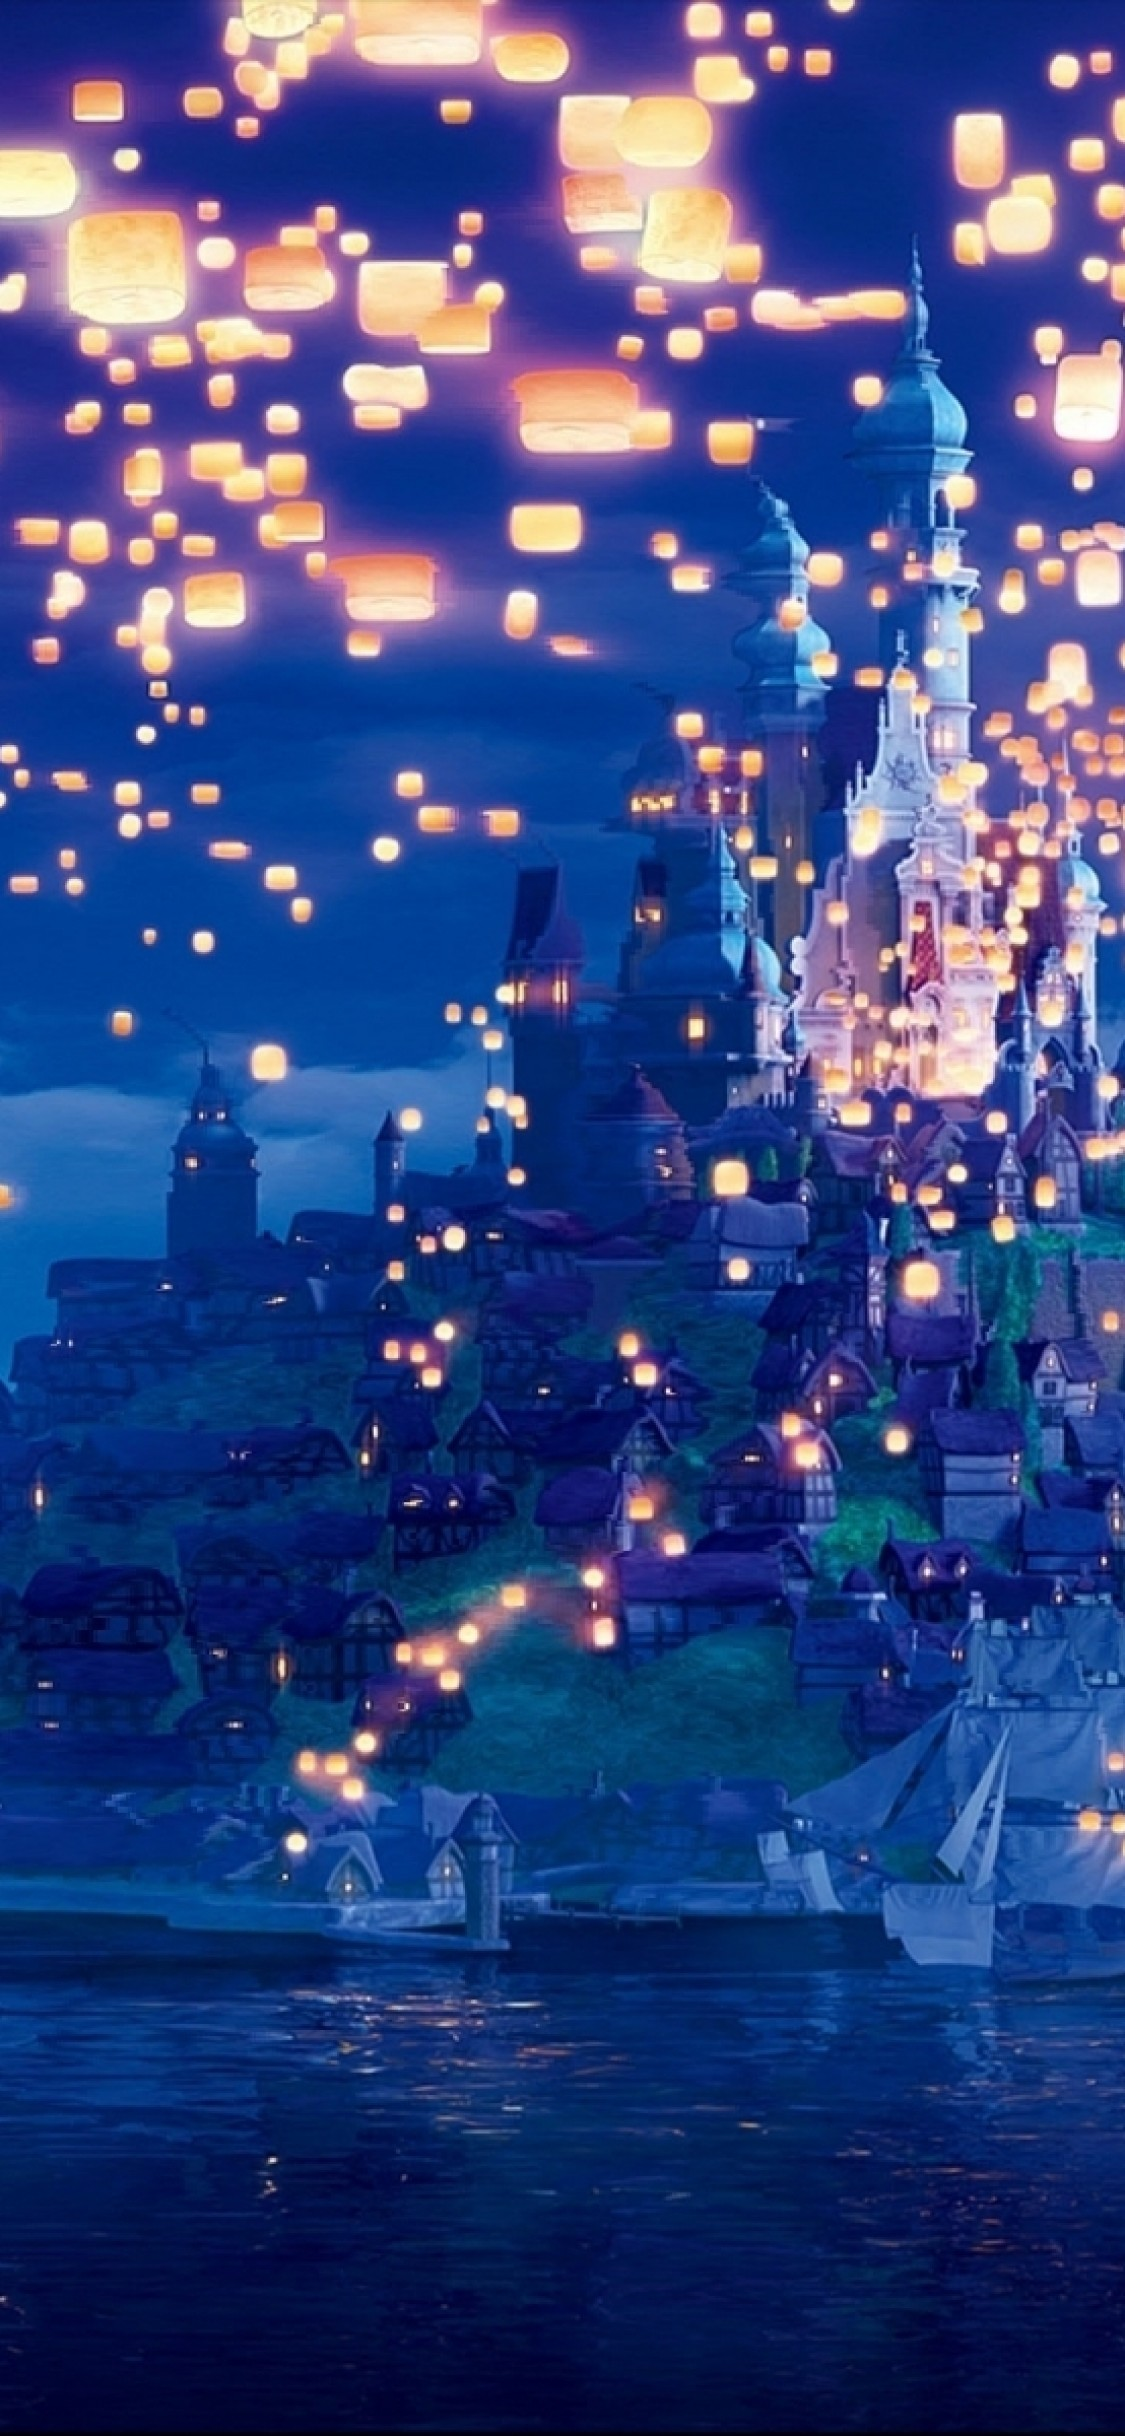 Tangled Lanterns Castle Long Hair Sky Artwork Beautiful Phone Wallpapers Disney 1125x2436 Wallpaper Teahub Io